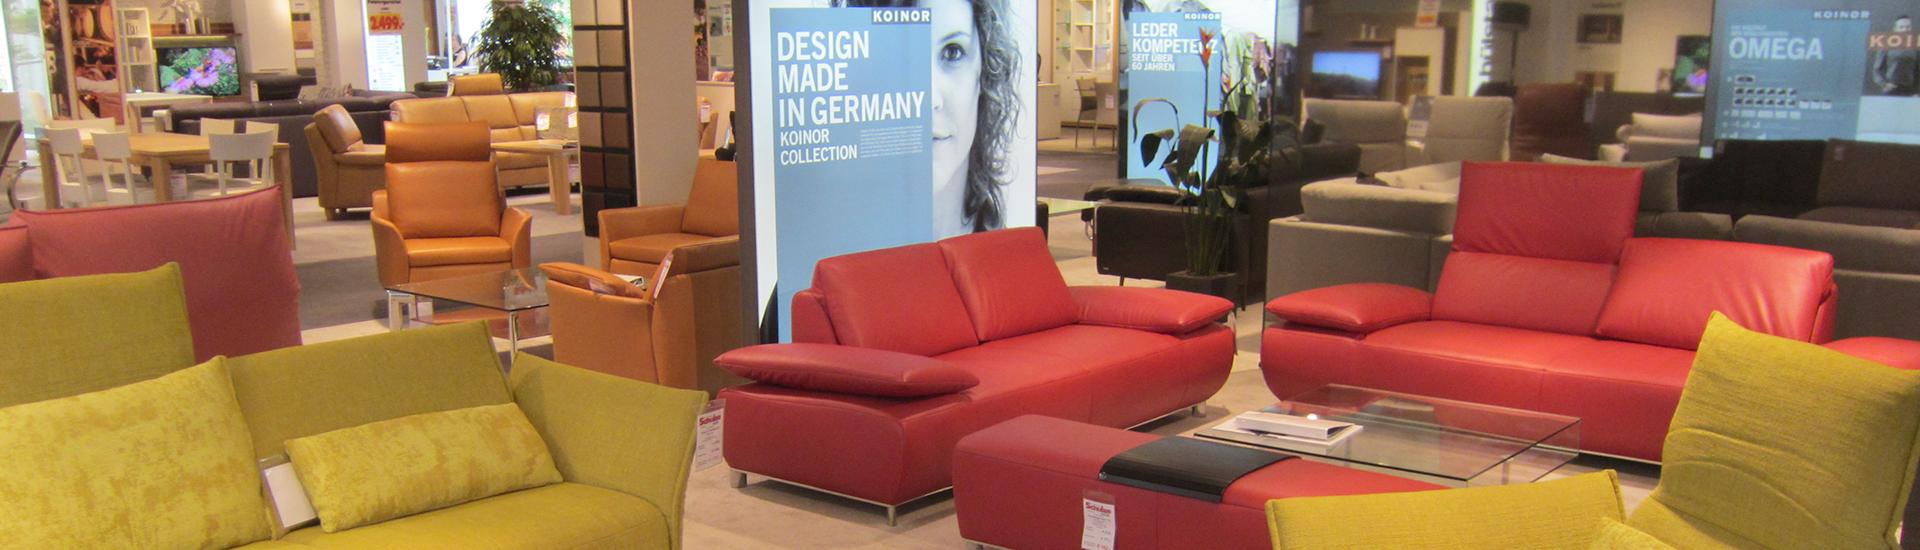 koinor sofas for friends einrichtungshaus schulze r dental. Black Bedroom Furniture Sets. Home Design Ideas